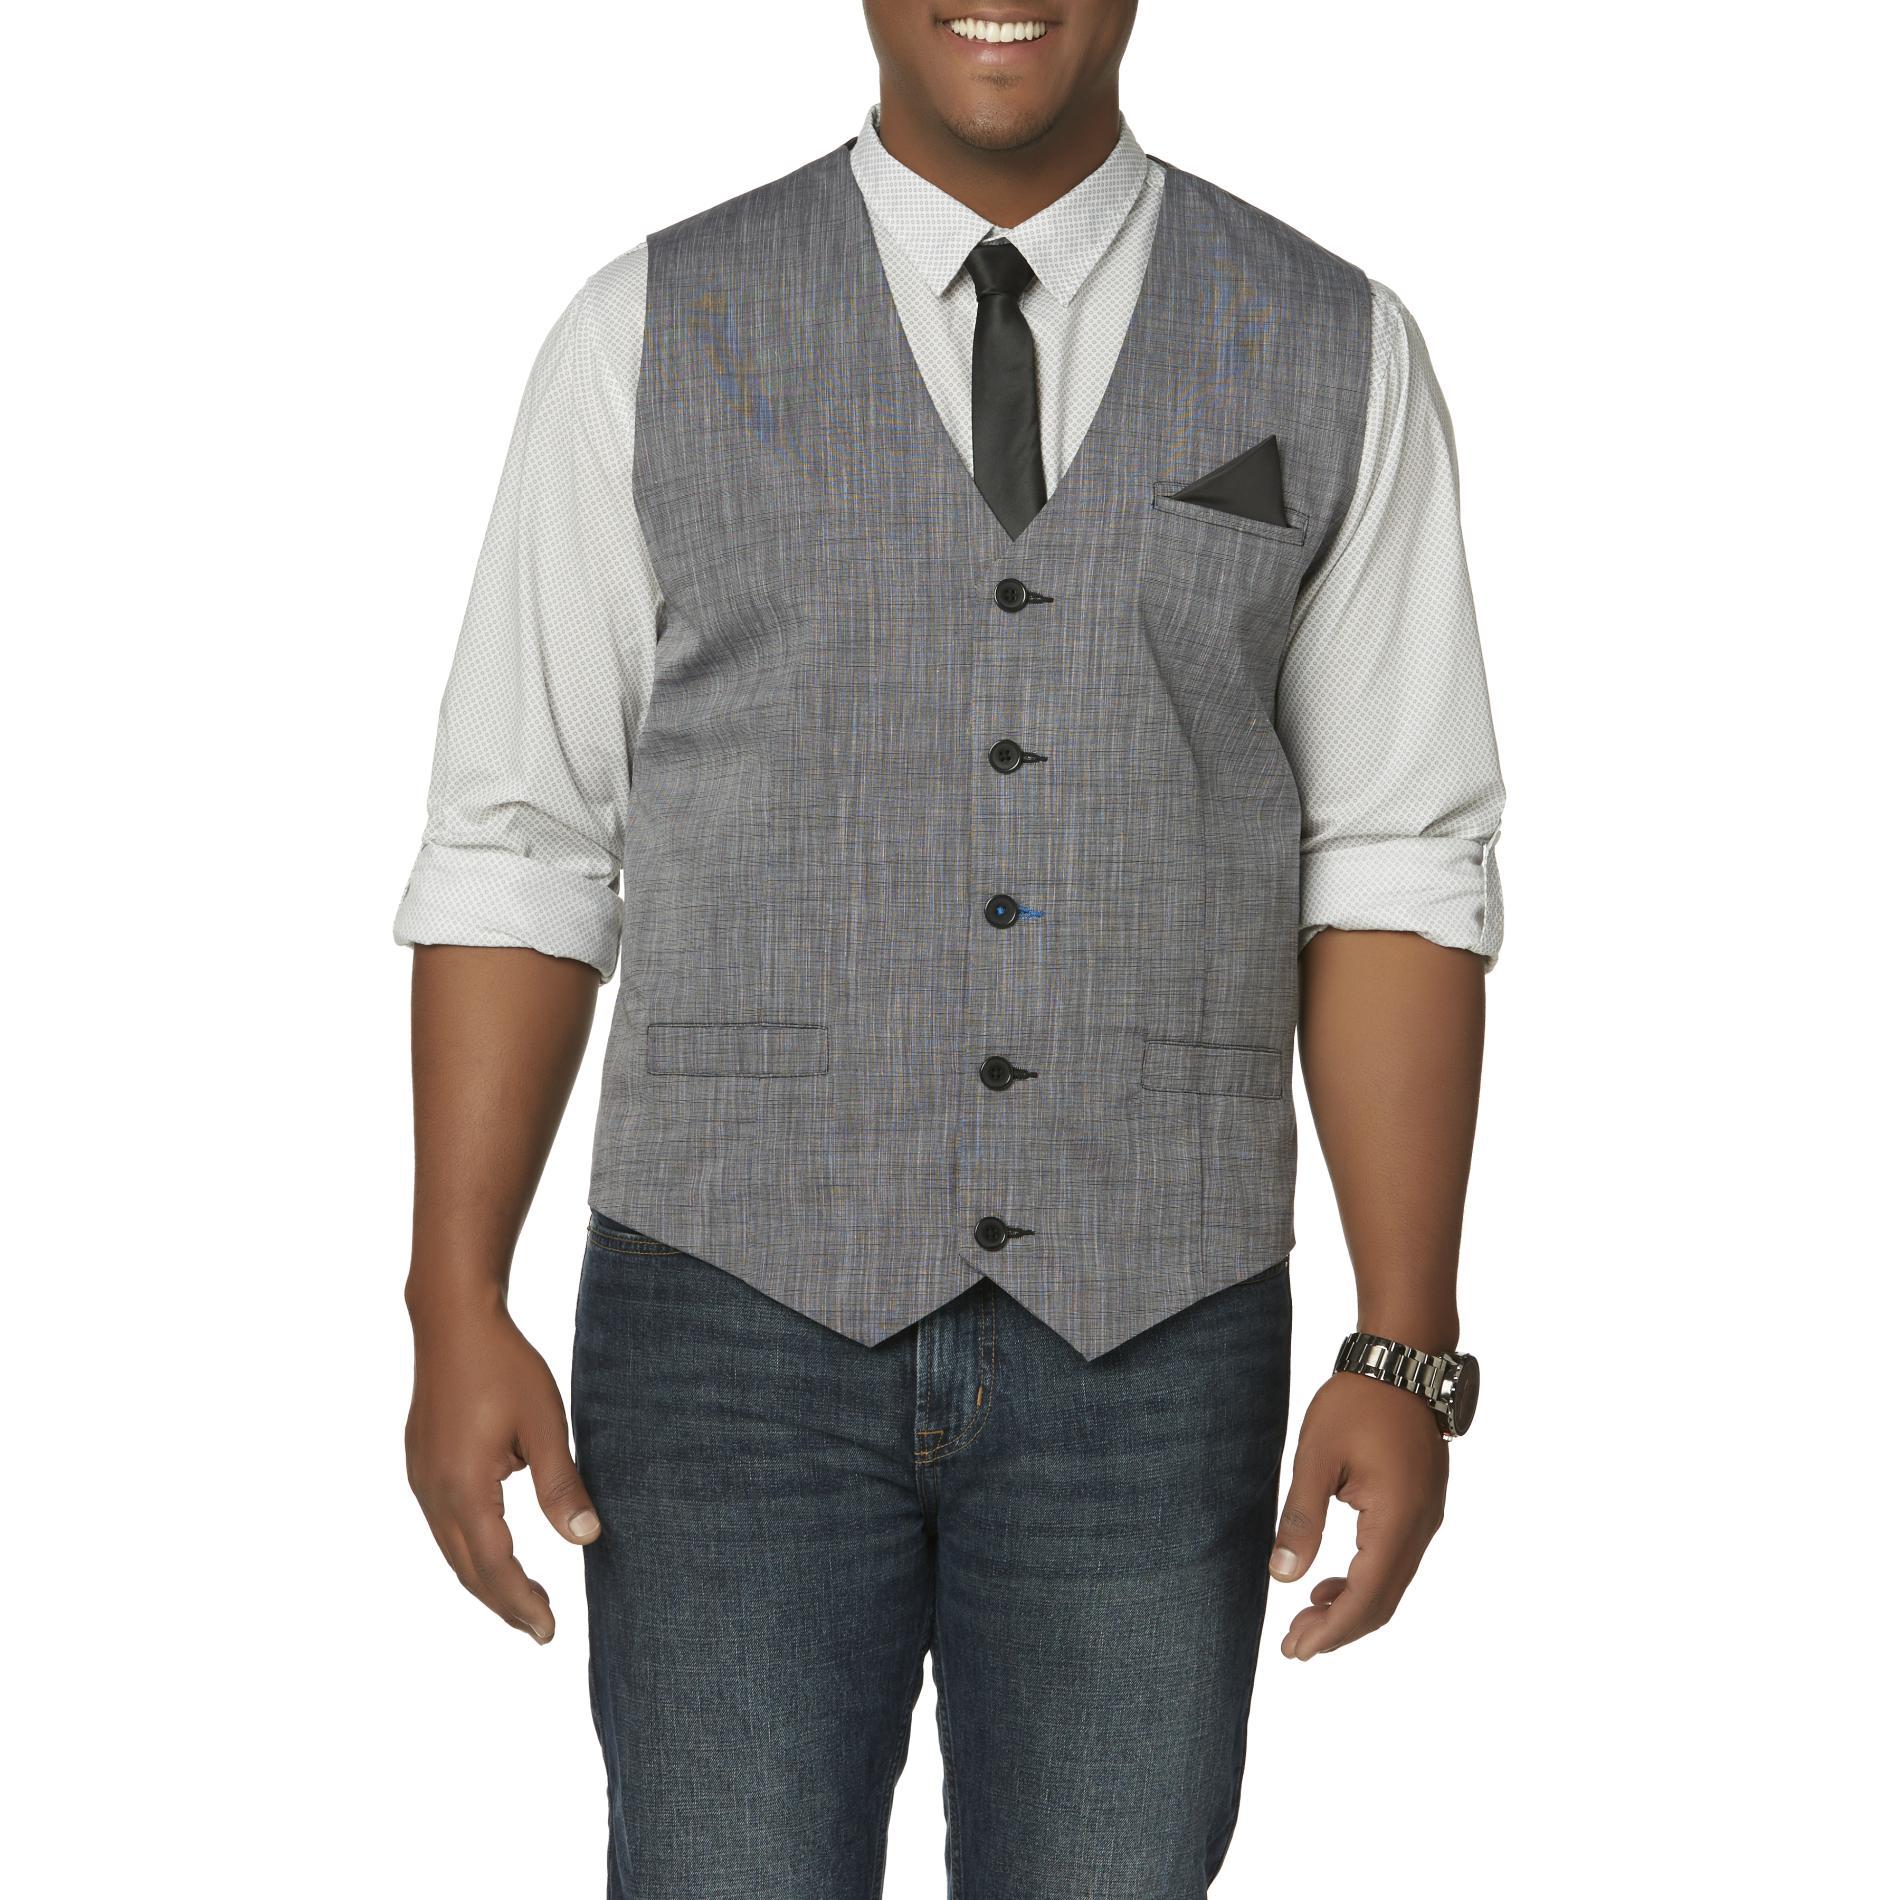 Attention Men' Big &tall Dress Shirt Vest & Necktie - Dots